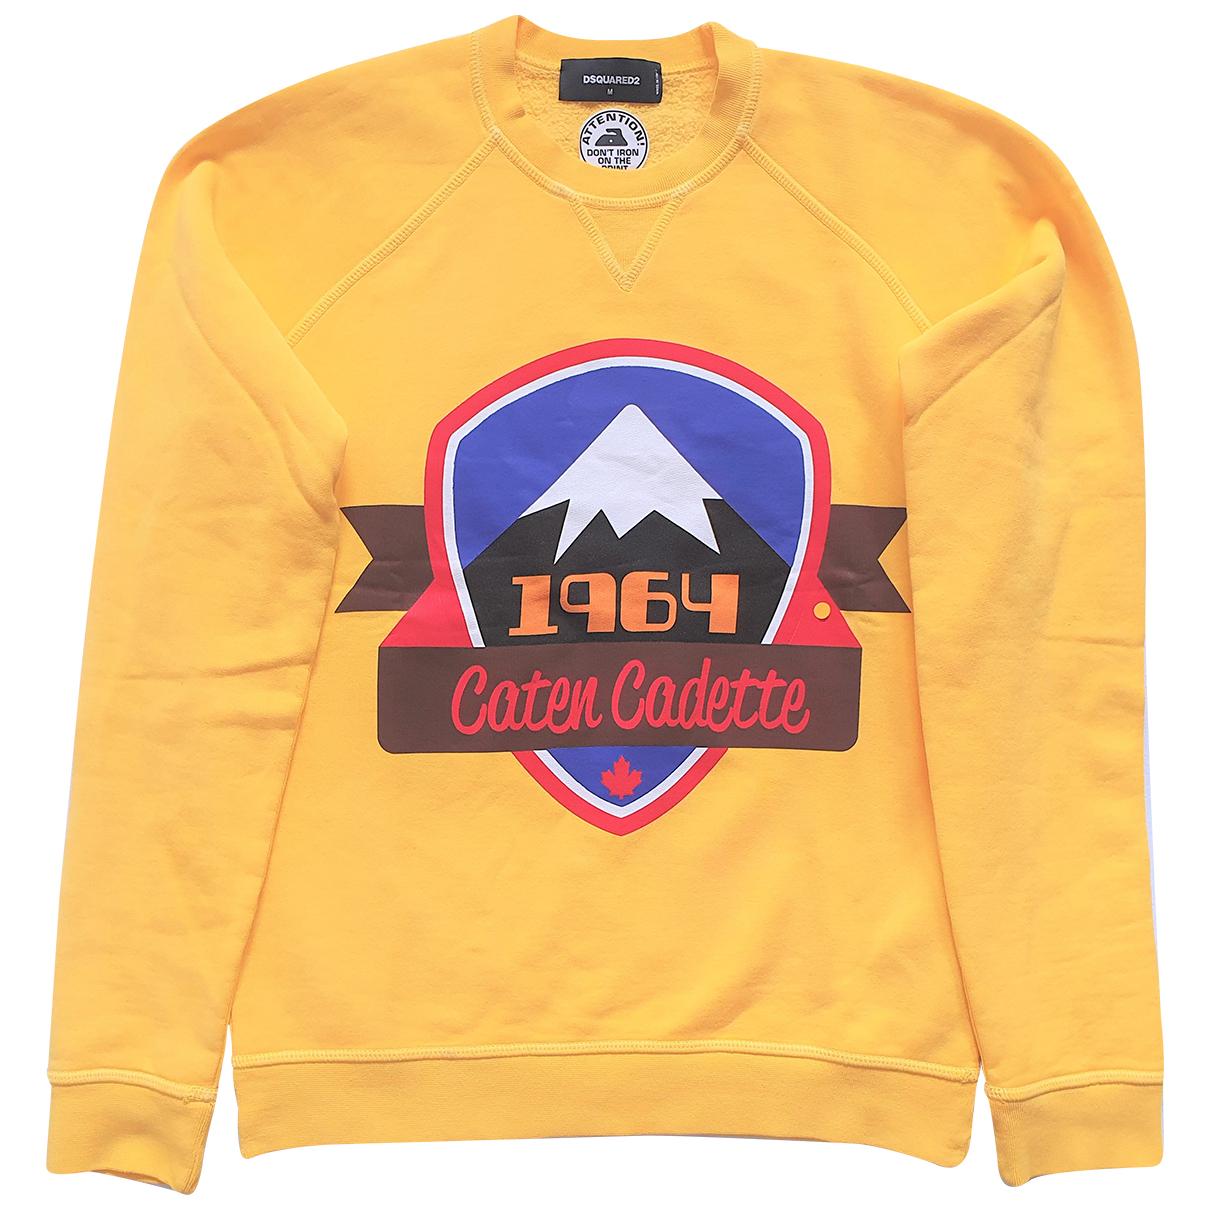 Dsquared2 N Yellow Cotton Knitwear & Sweatshirts for Men M International